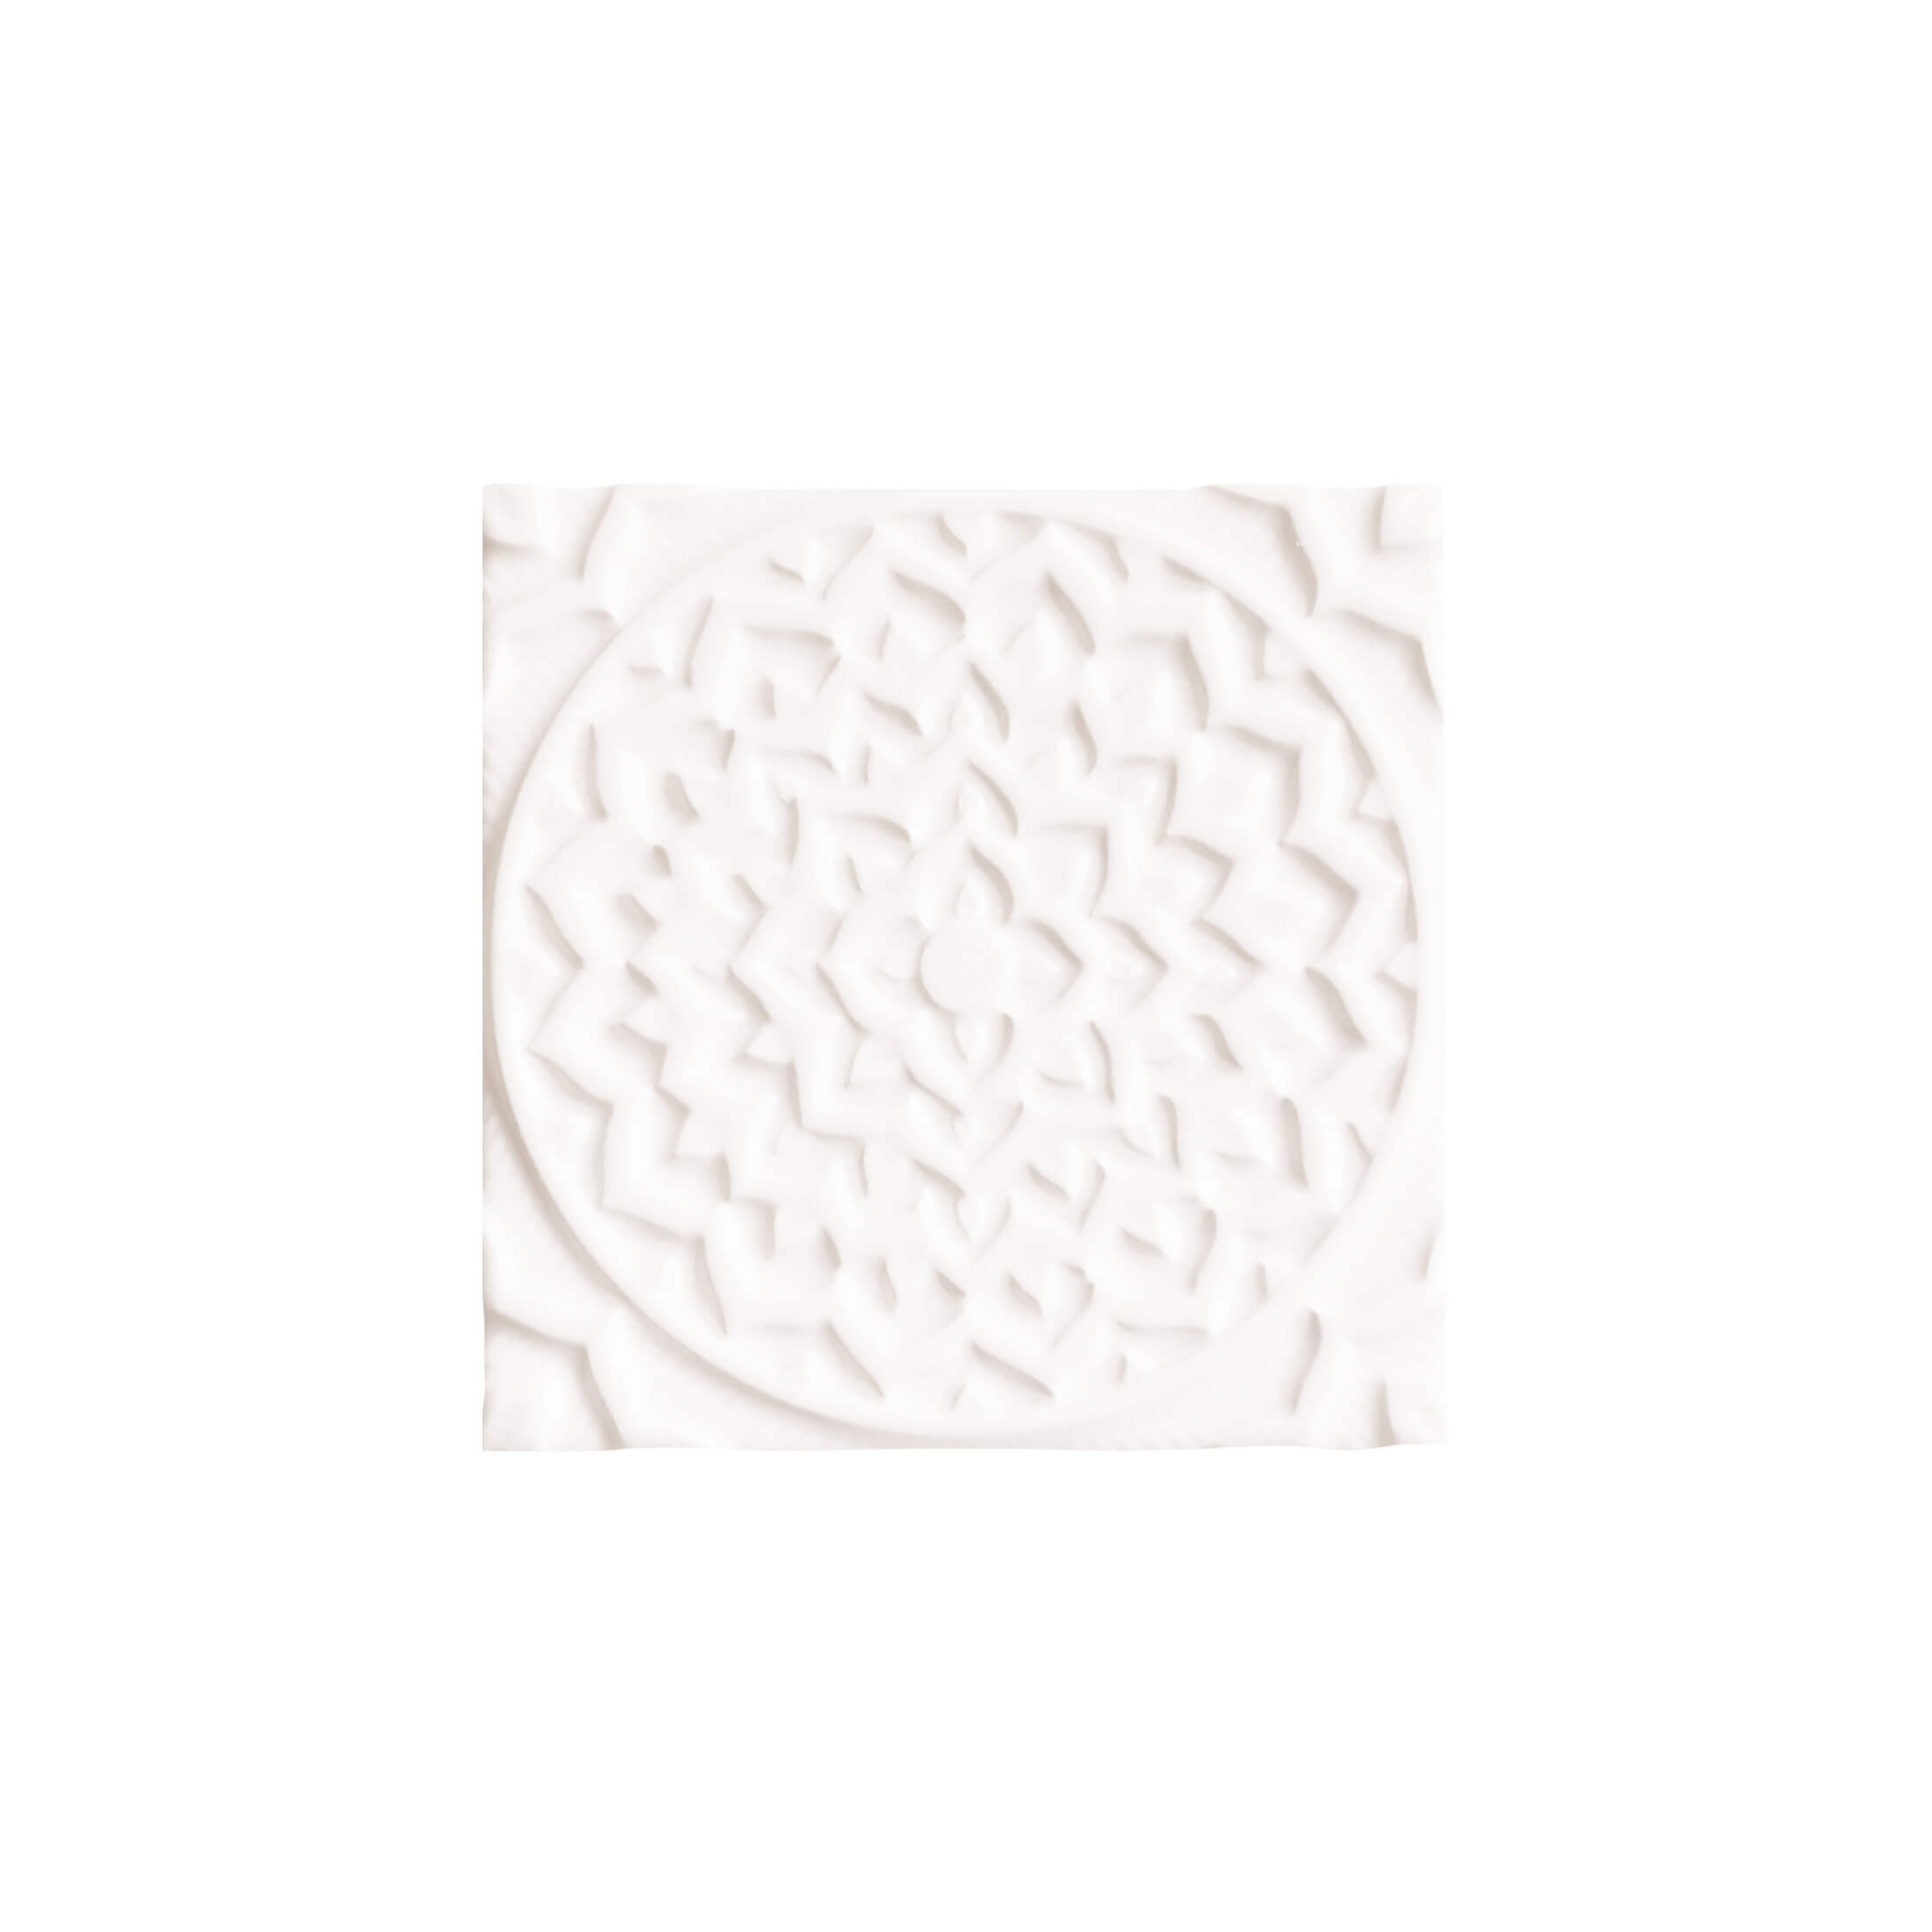 ADEH4001 - RELIEVE MANDALA COSMOS - 15 cm X 15 cm